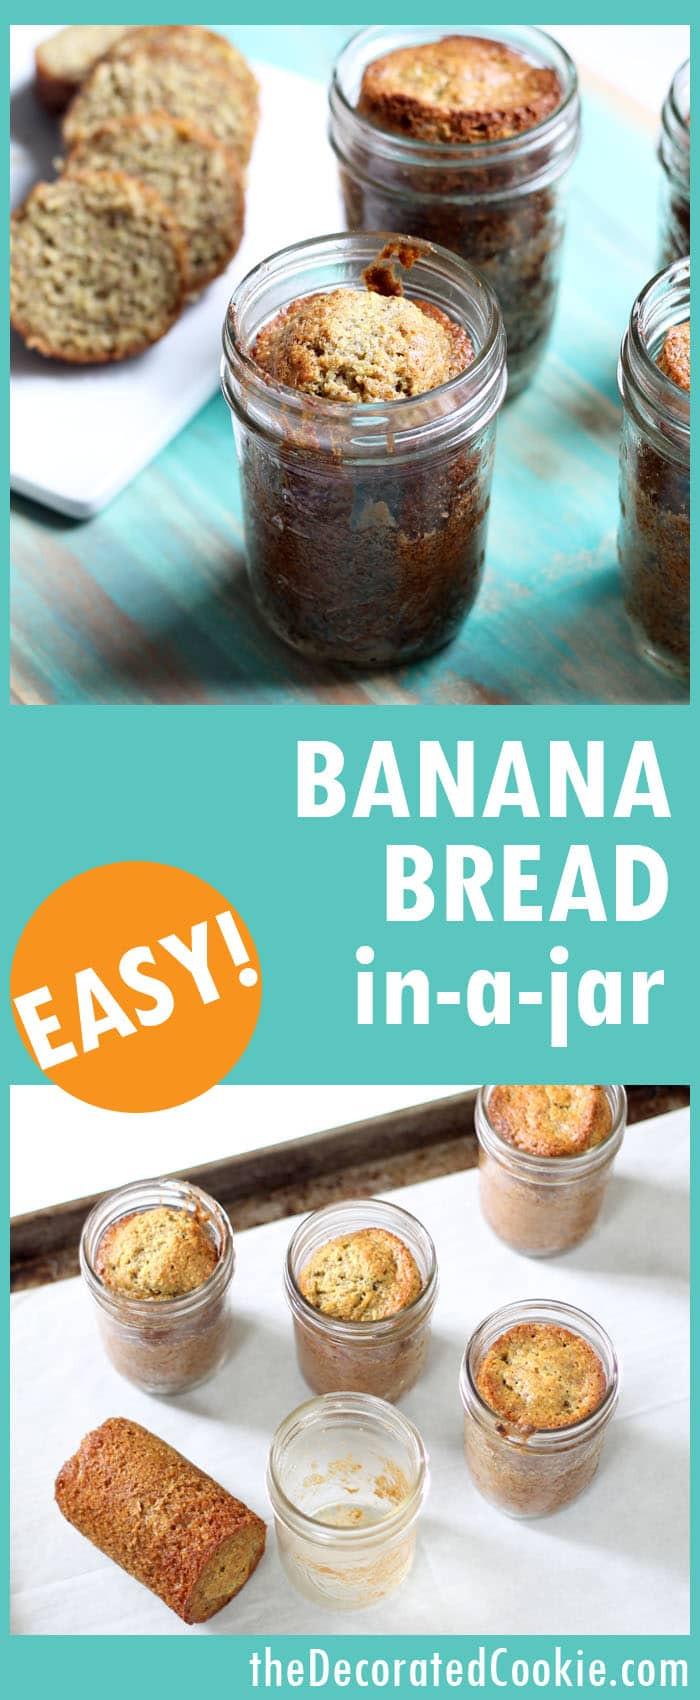 Baking Healthy Bread  How to bake banana bread in a jar Easy healthy banana